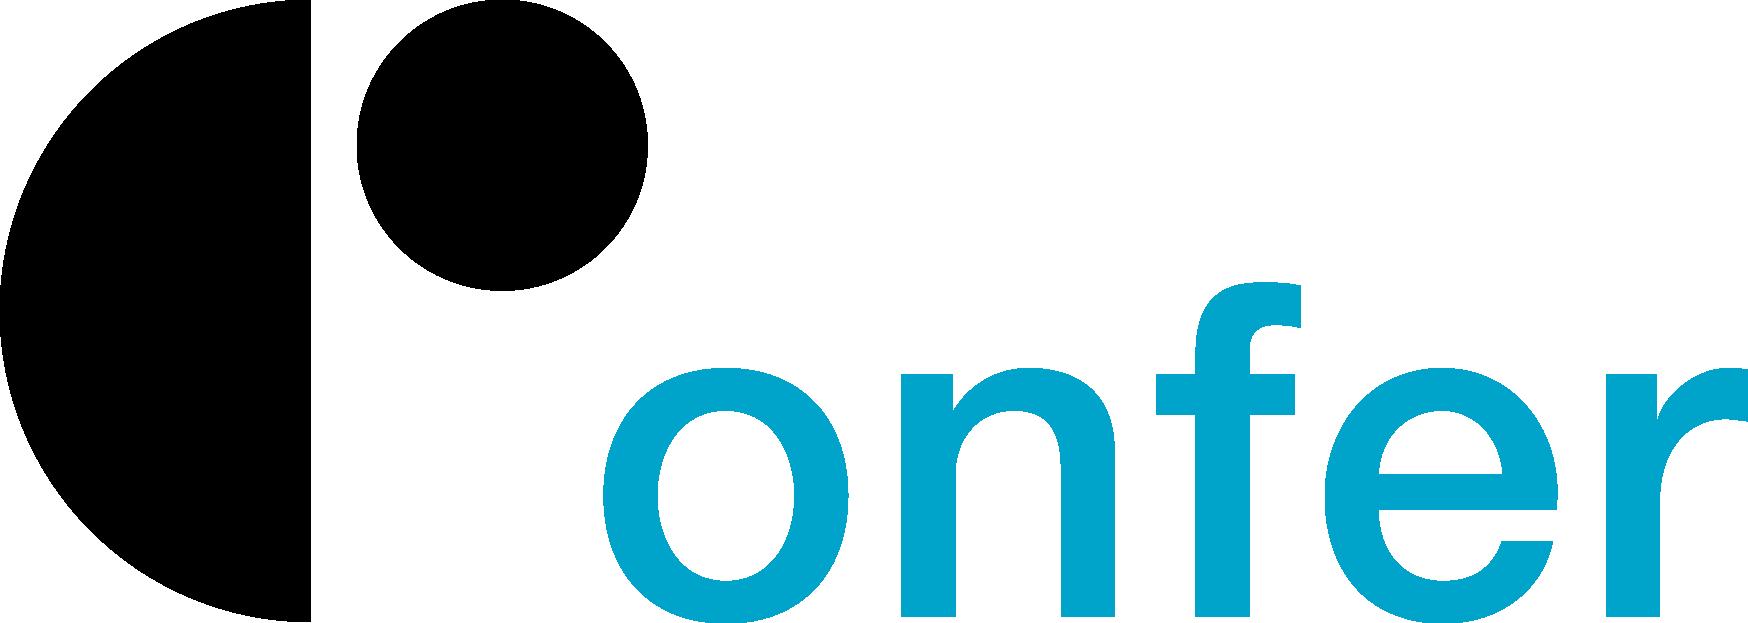 Confer_logo